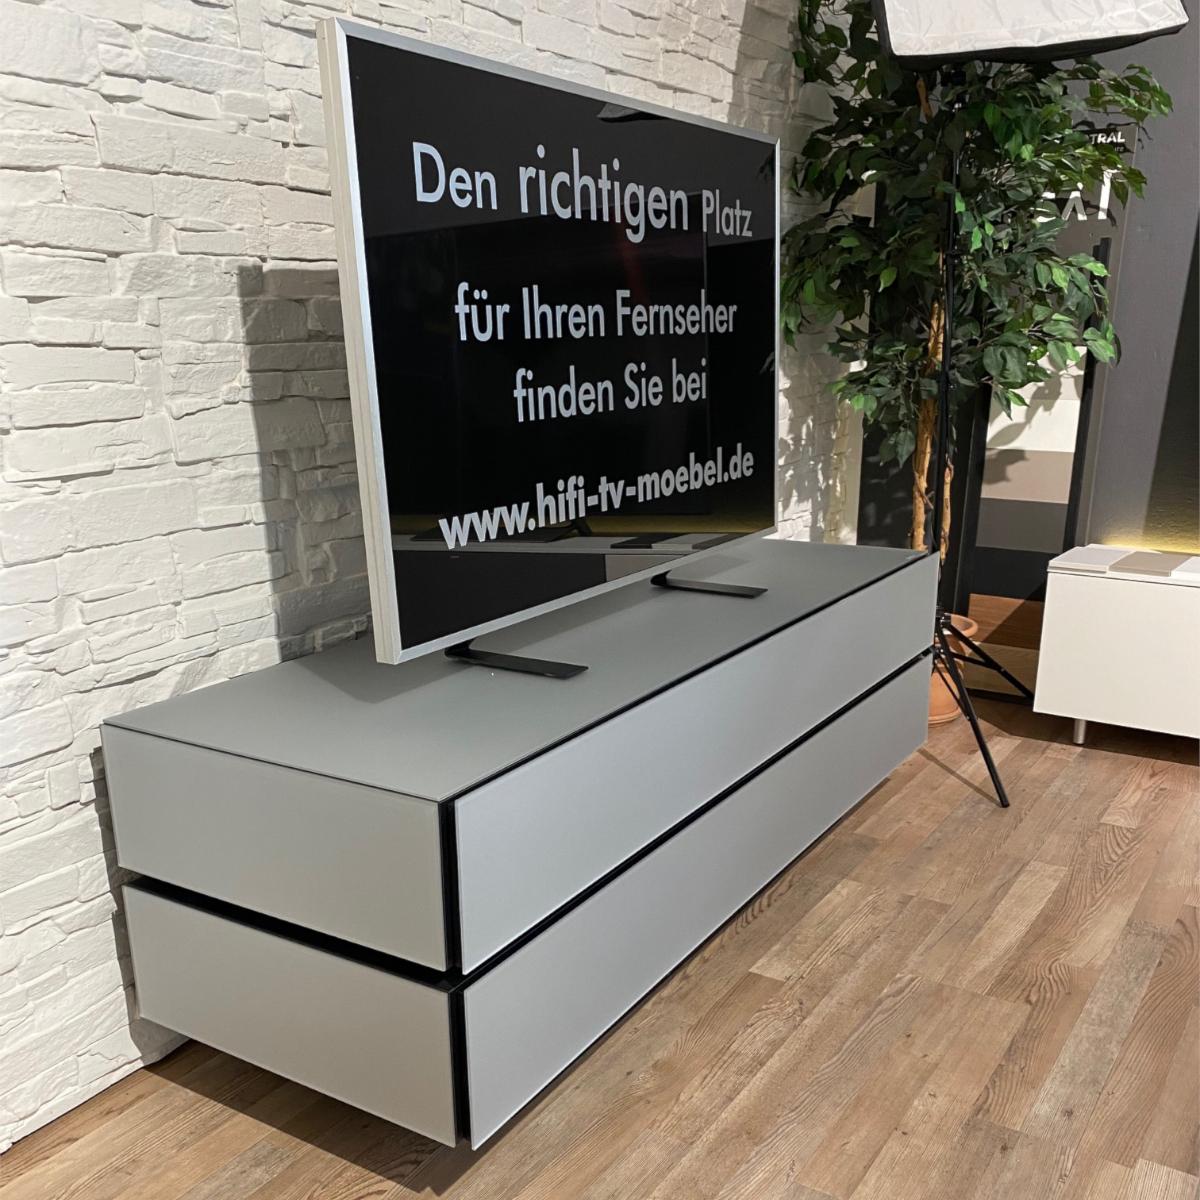 Lowboard, geschlossenes TV Möbel, mit verdeckter Kabelführung, TV Lowboard, TV Sideboard